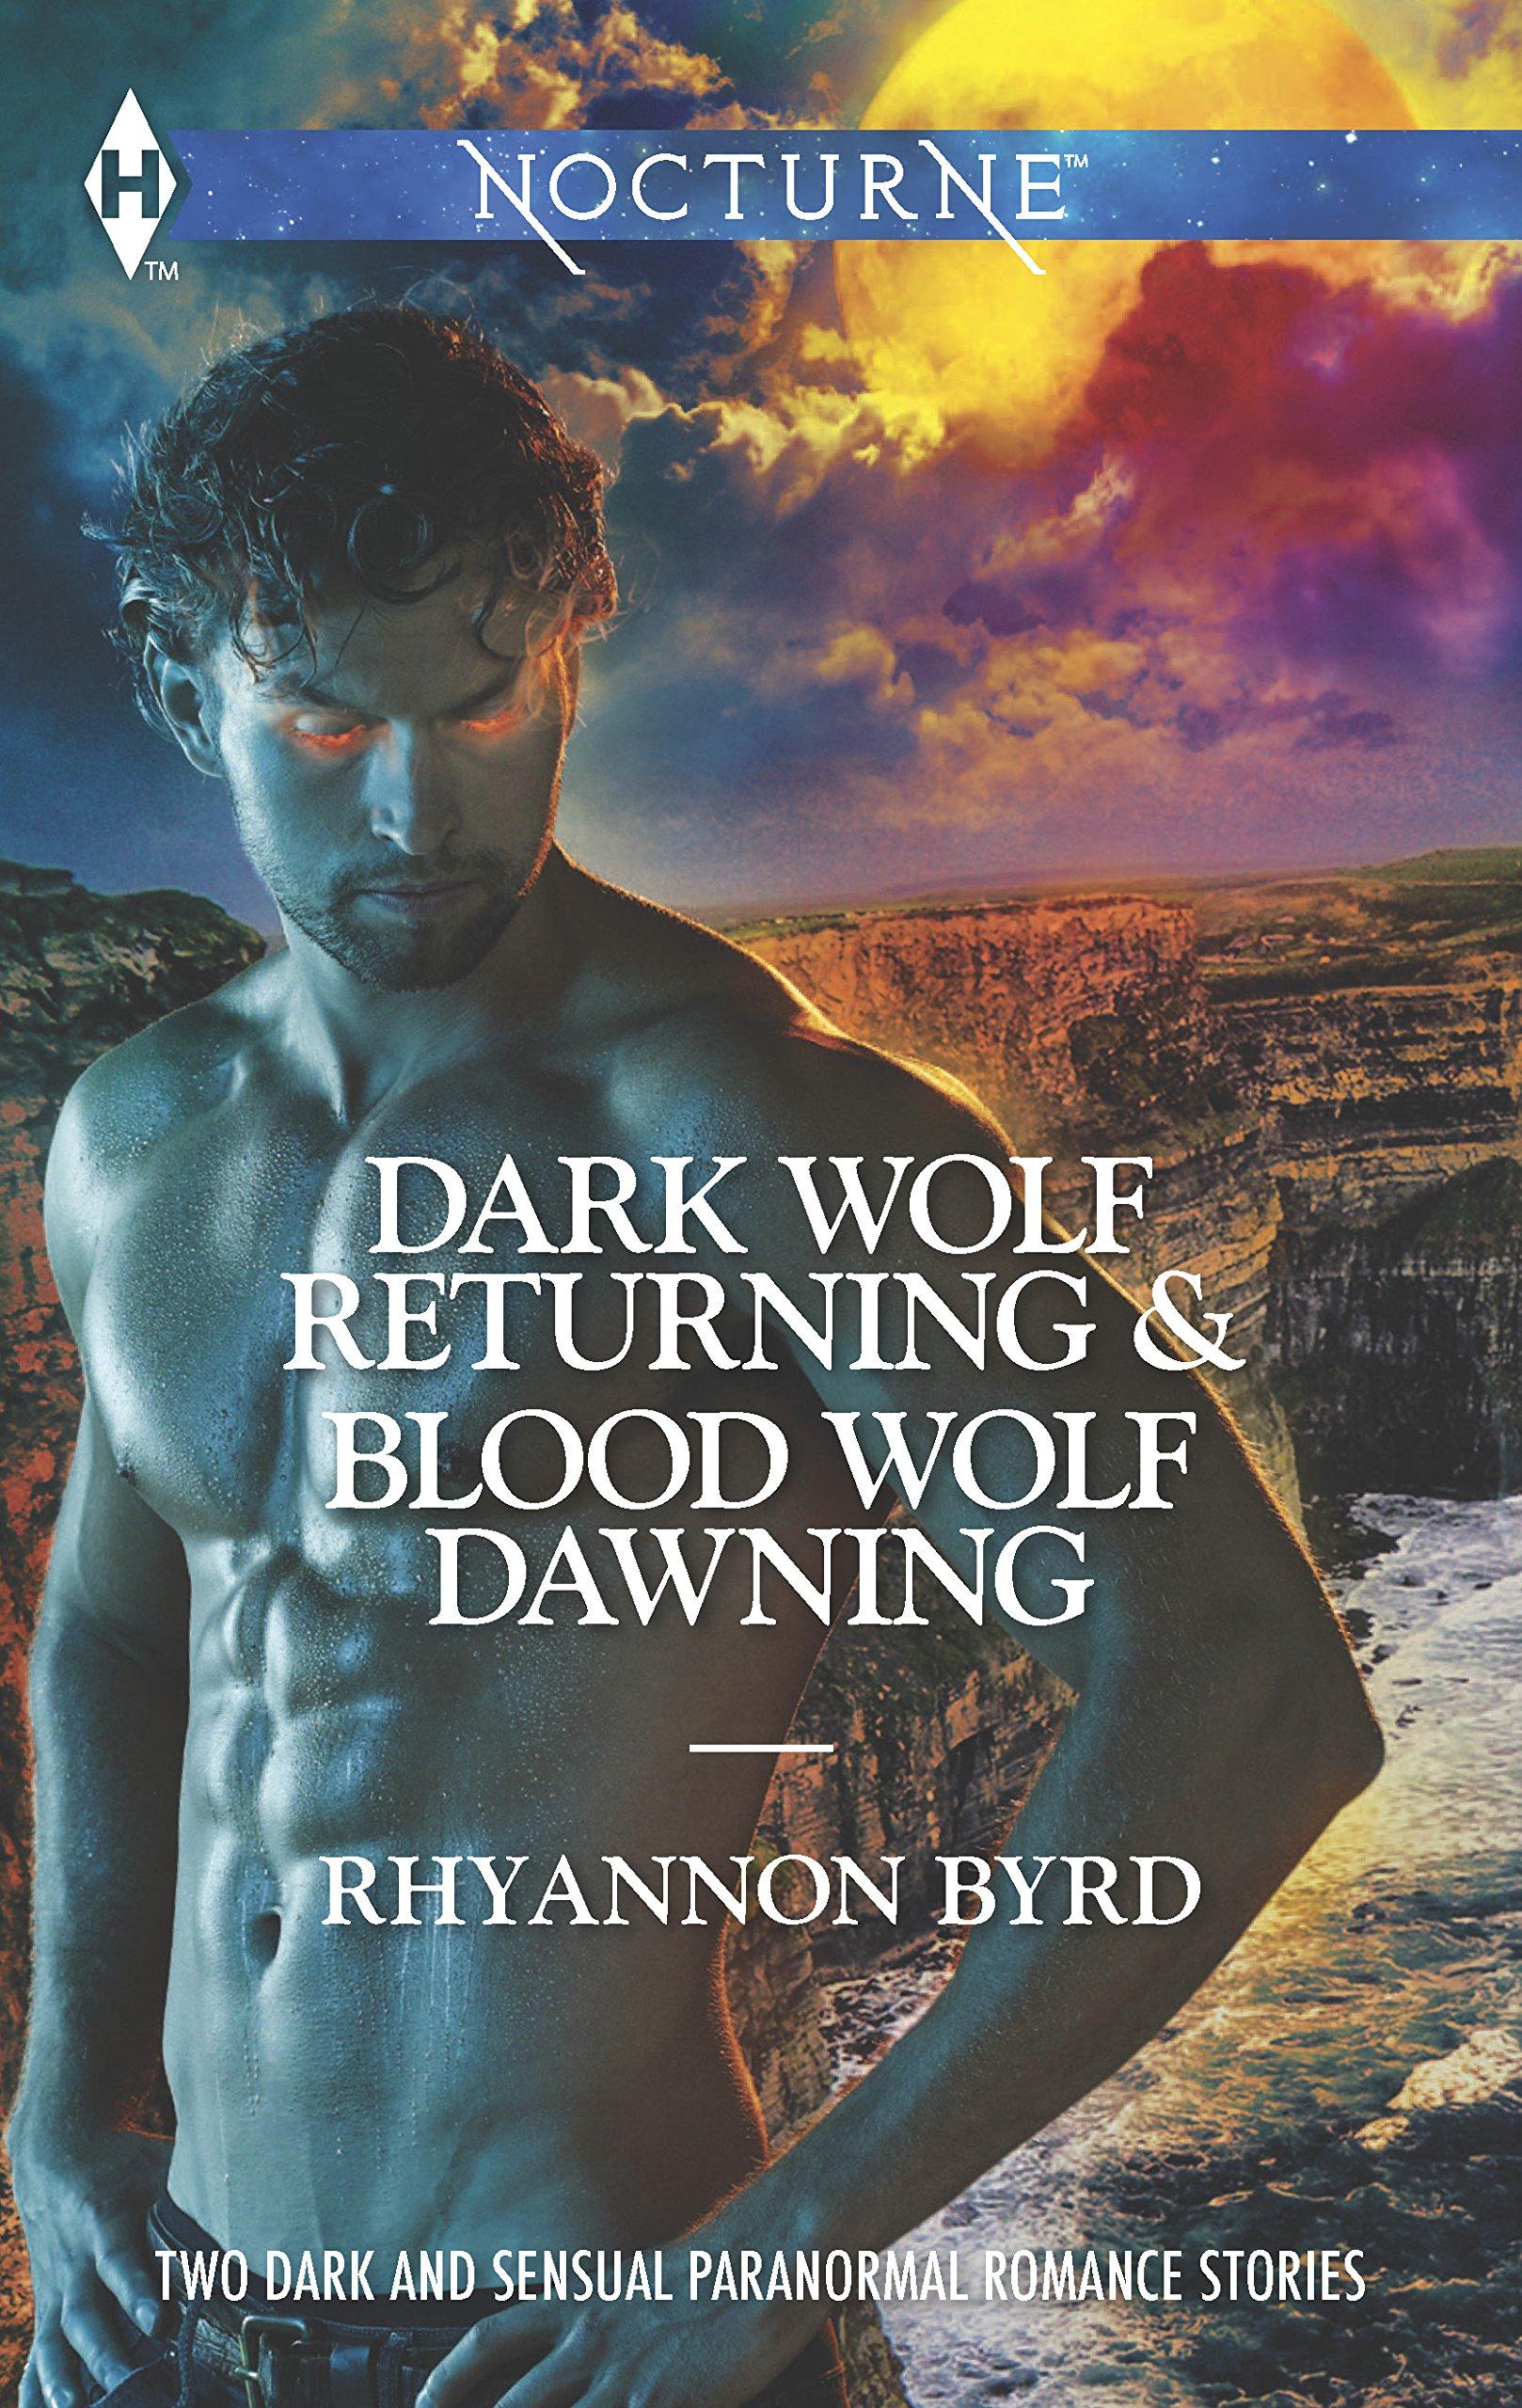 Dark Wolf Returning and Blood Wolf Dawning: An Anthology (Harlequin Nocturne) PDF